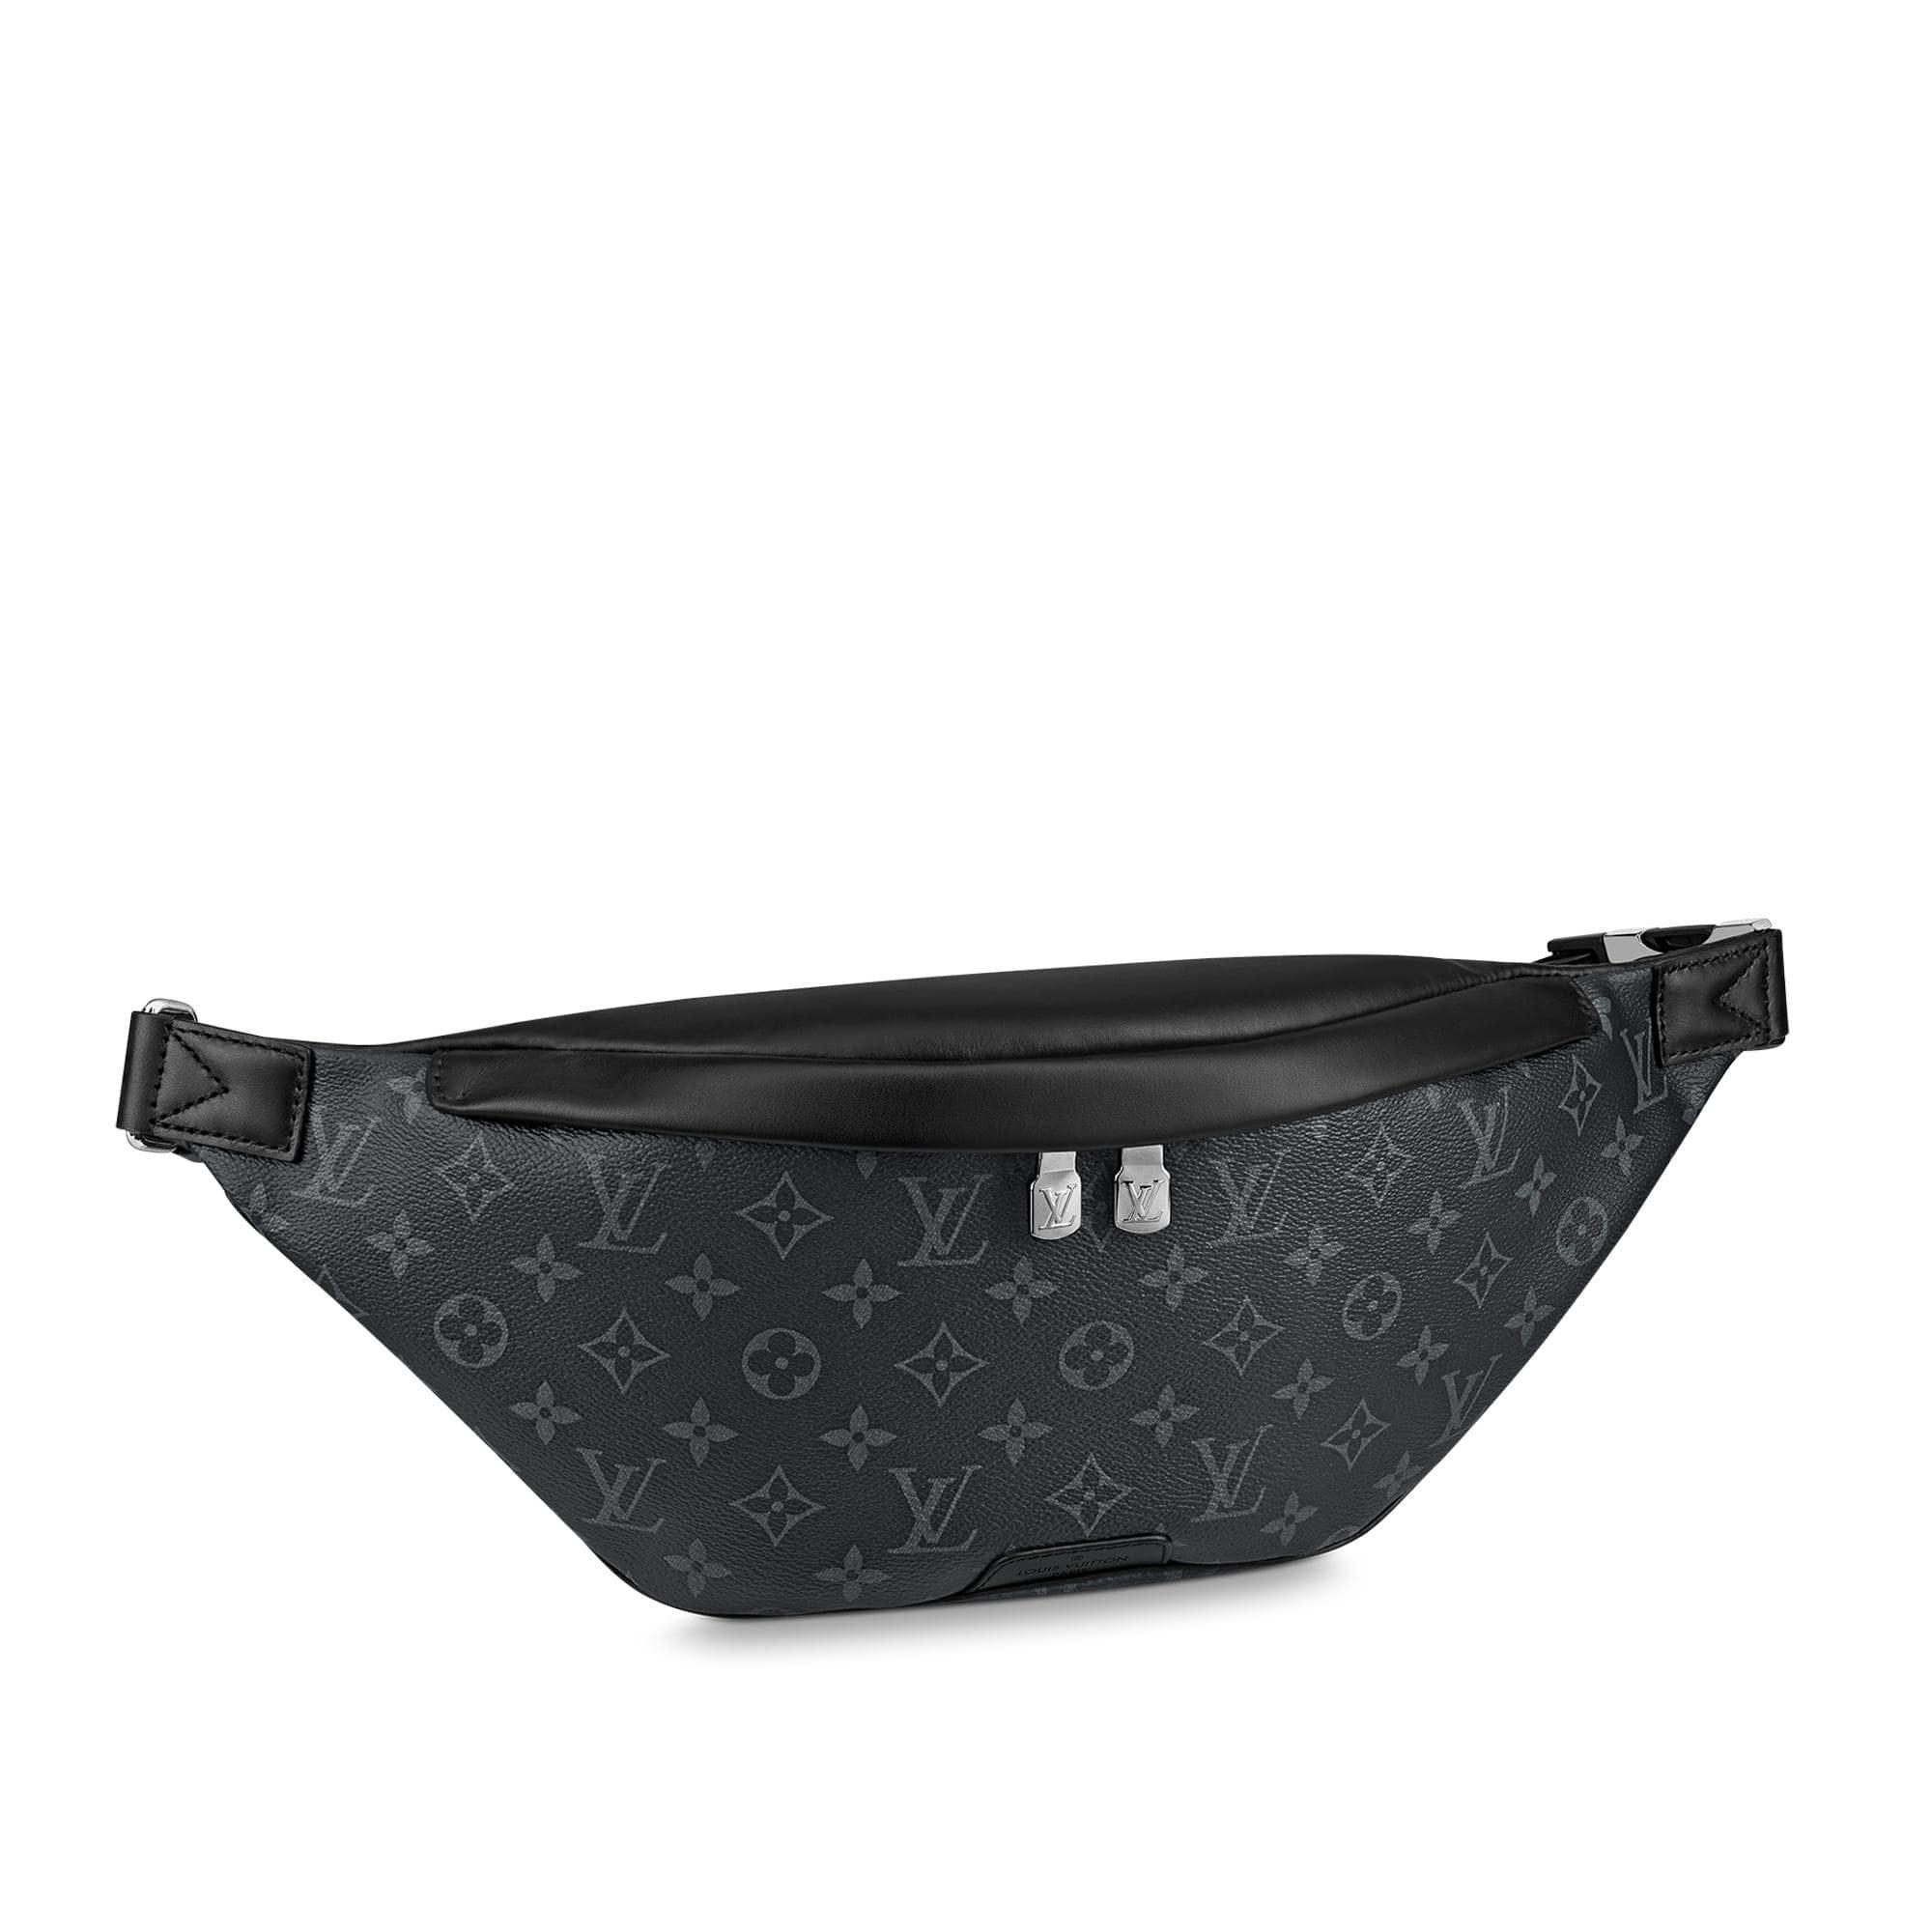 Louis Vuitton Discovery Bumbag Monogram Eclipse Black